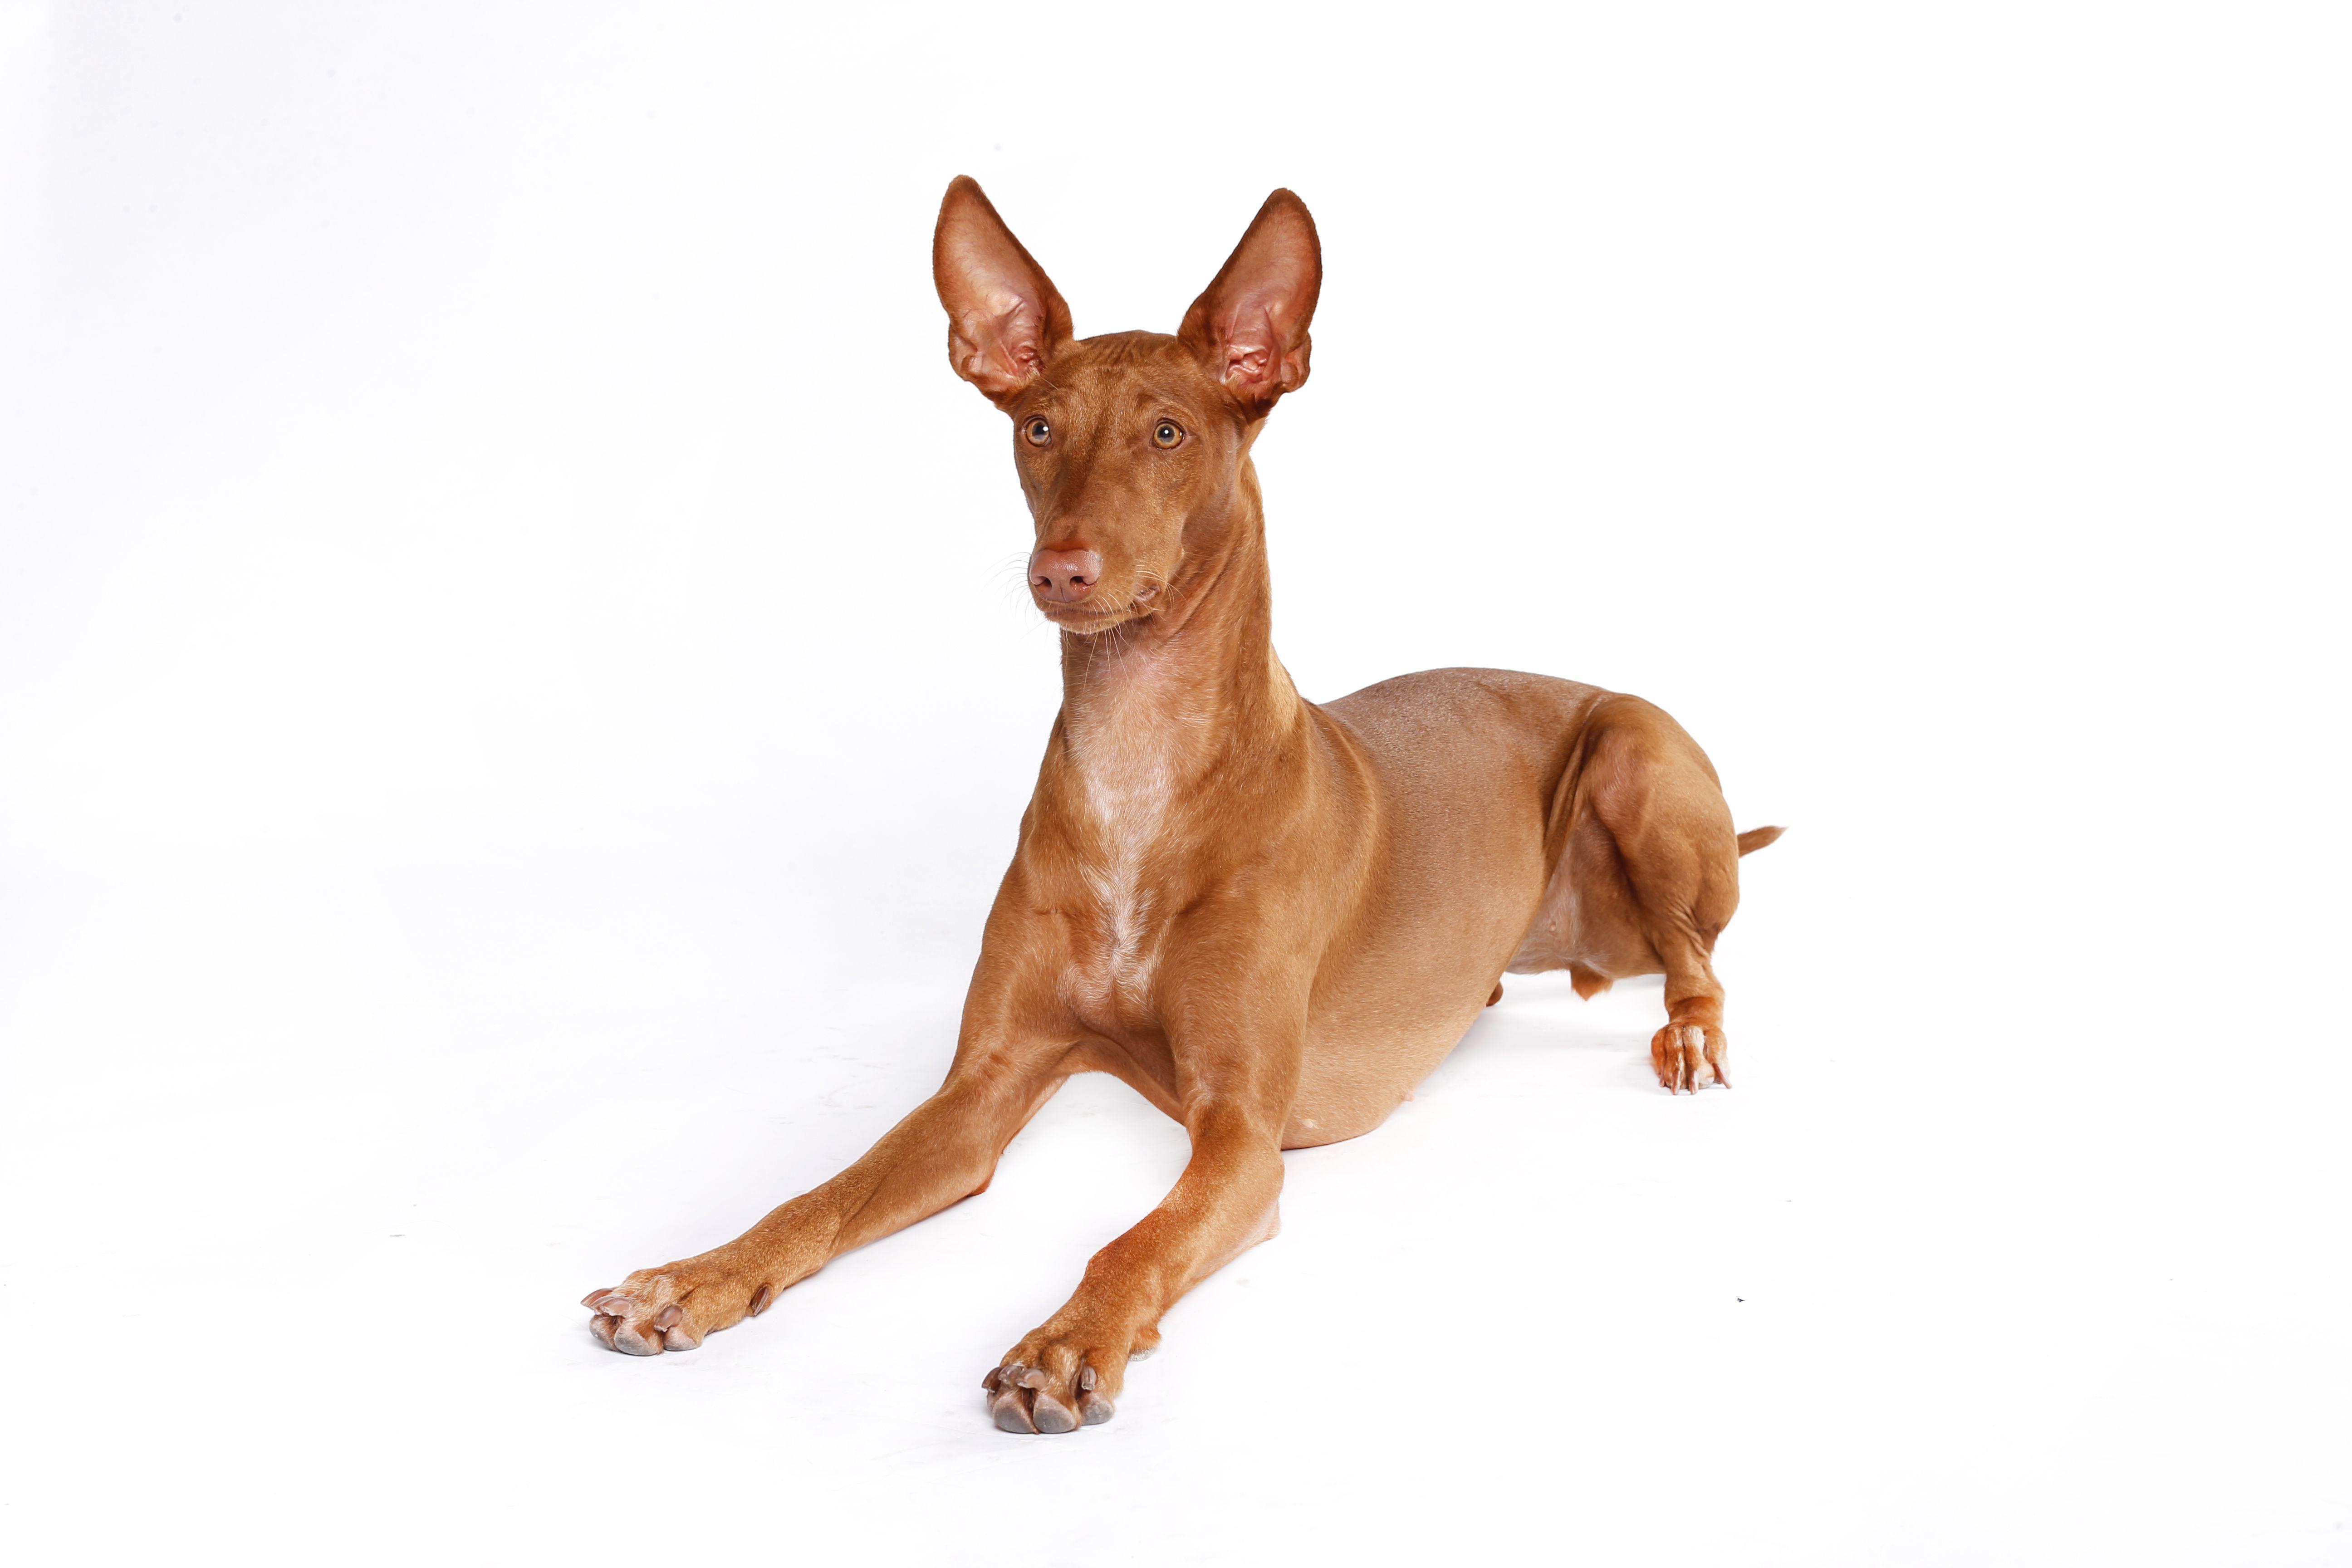 Pharaoh hound lying down